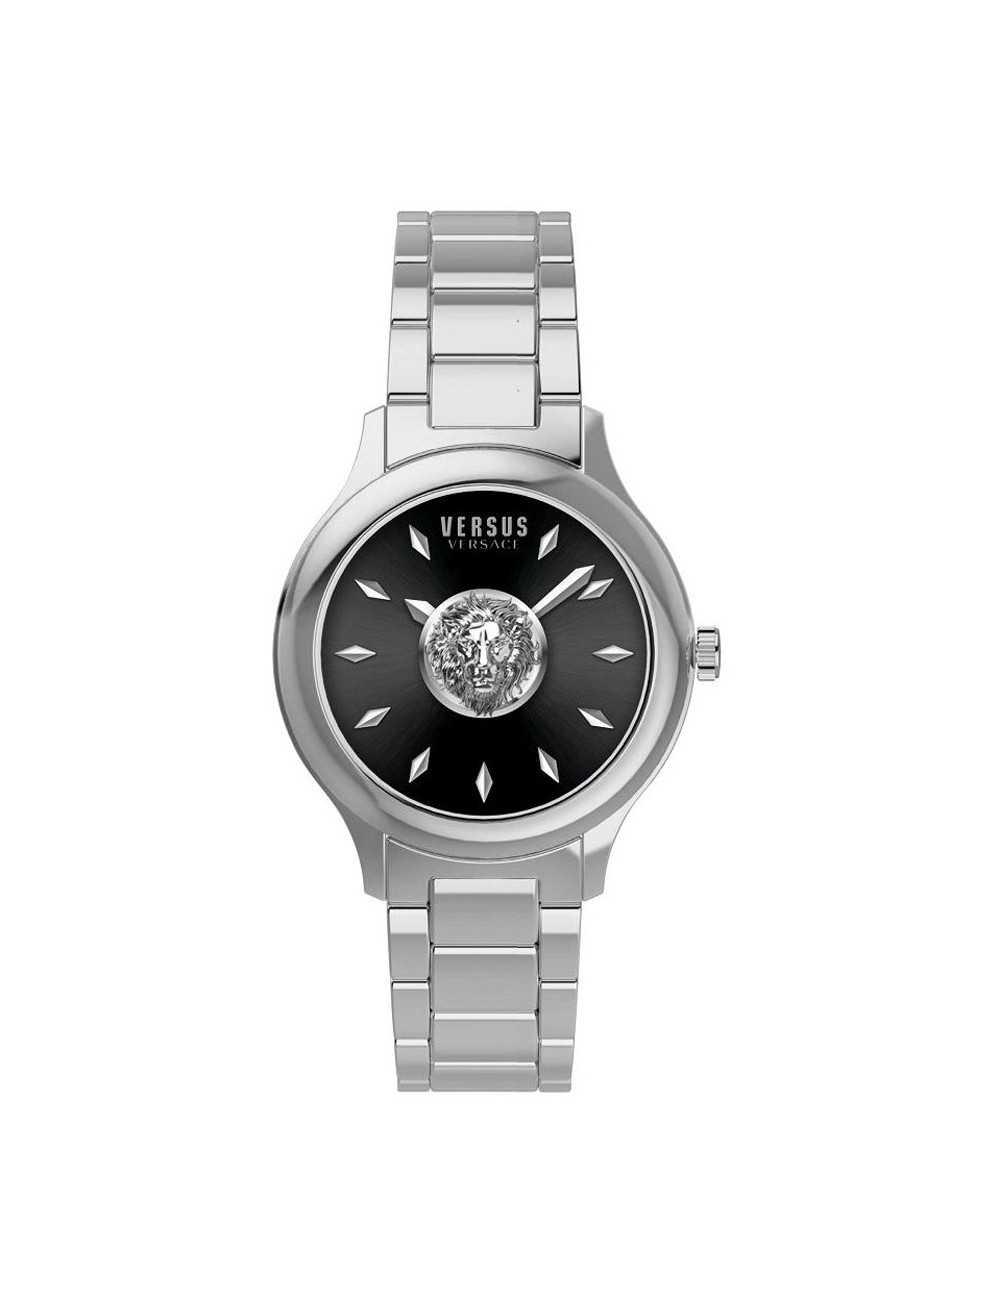 Dámske hodinky Versus VSP411519 Tokai